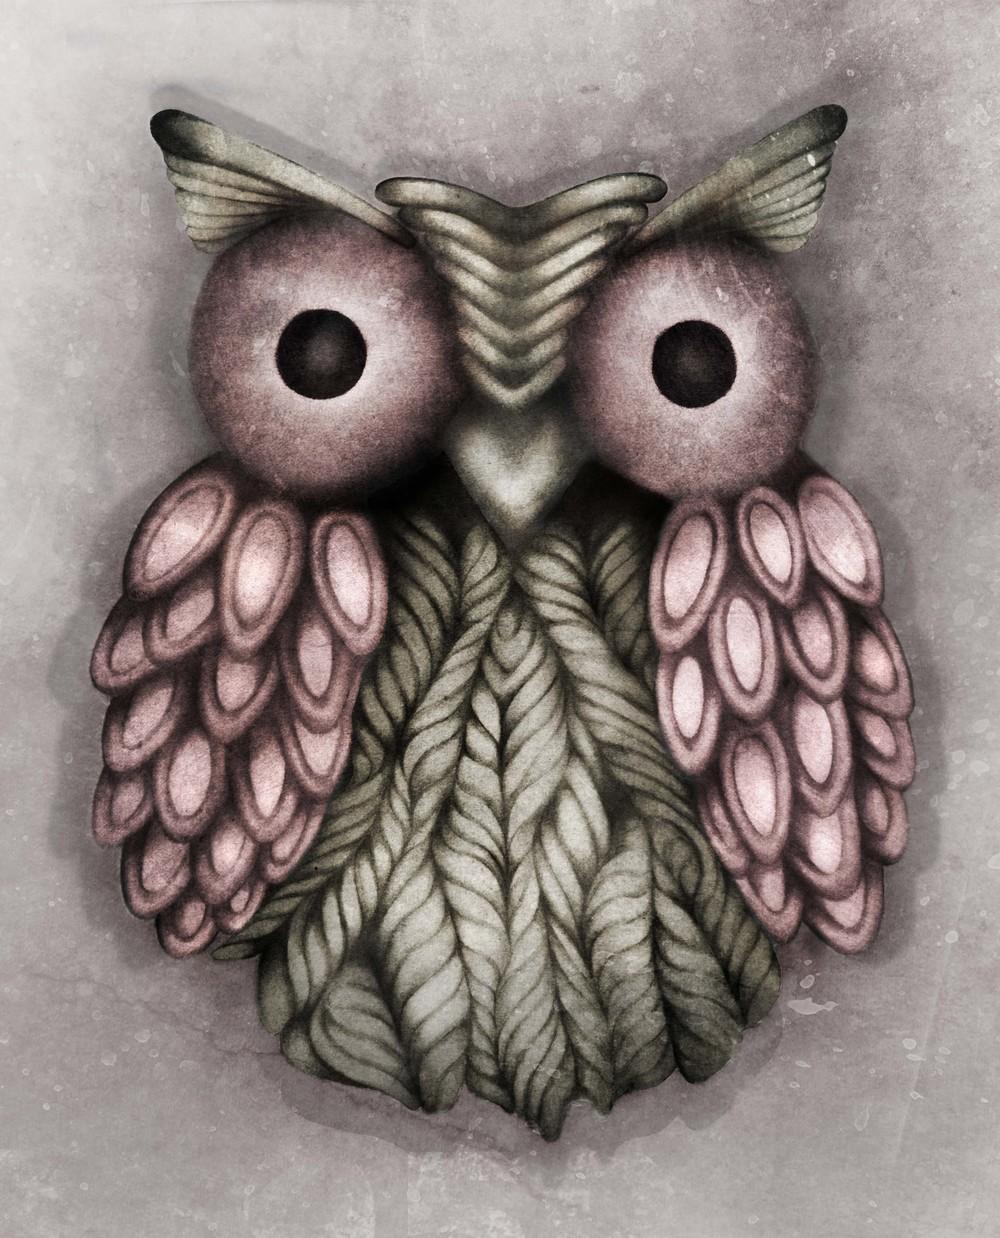 Adrianna_Grezak_Francis_owl_drawing